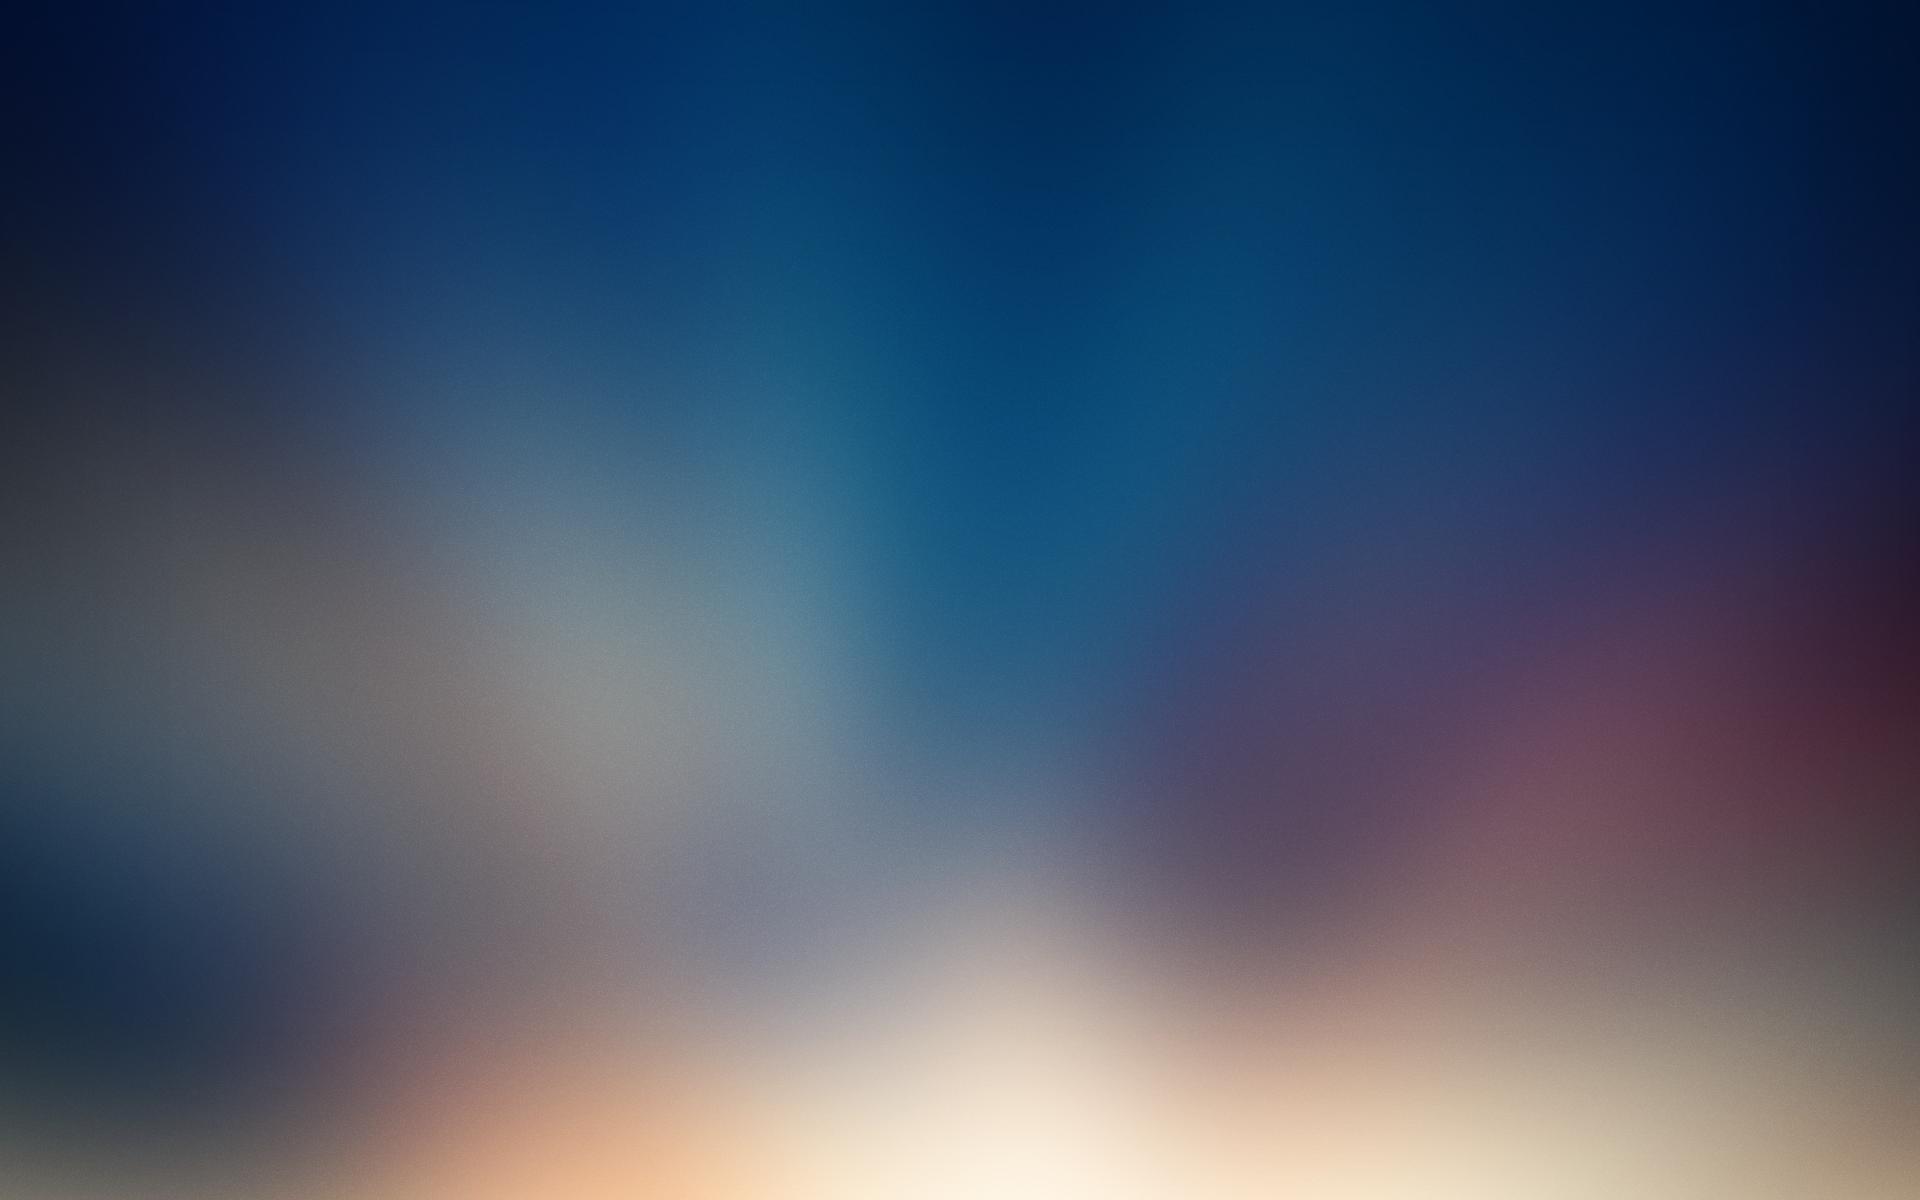 gradient-background-26046-26731-hd-wallpapers jpg - Home